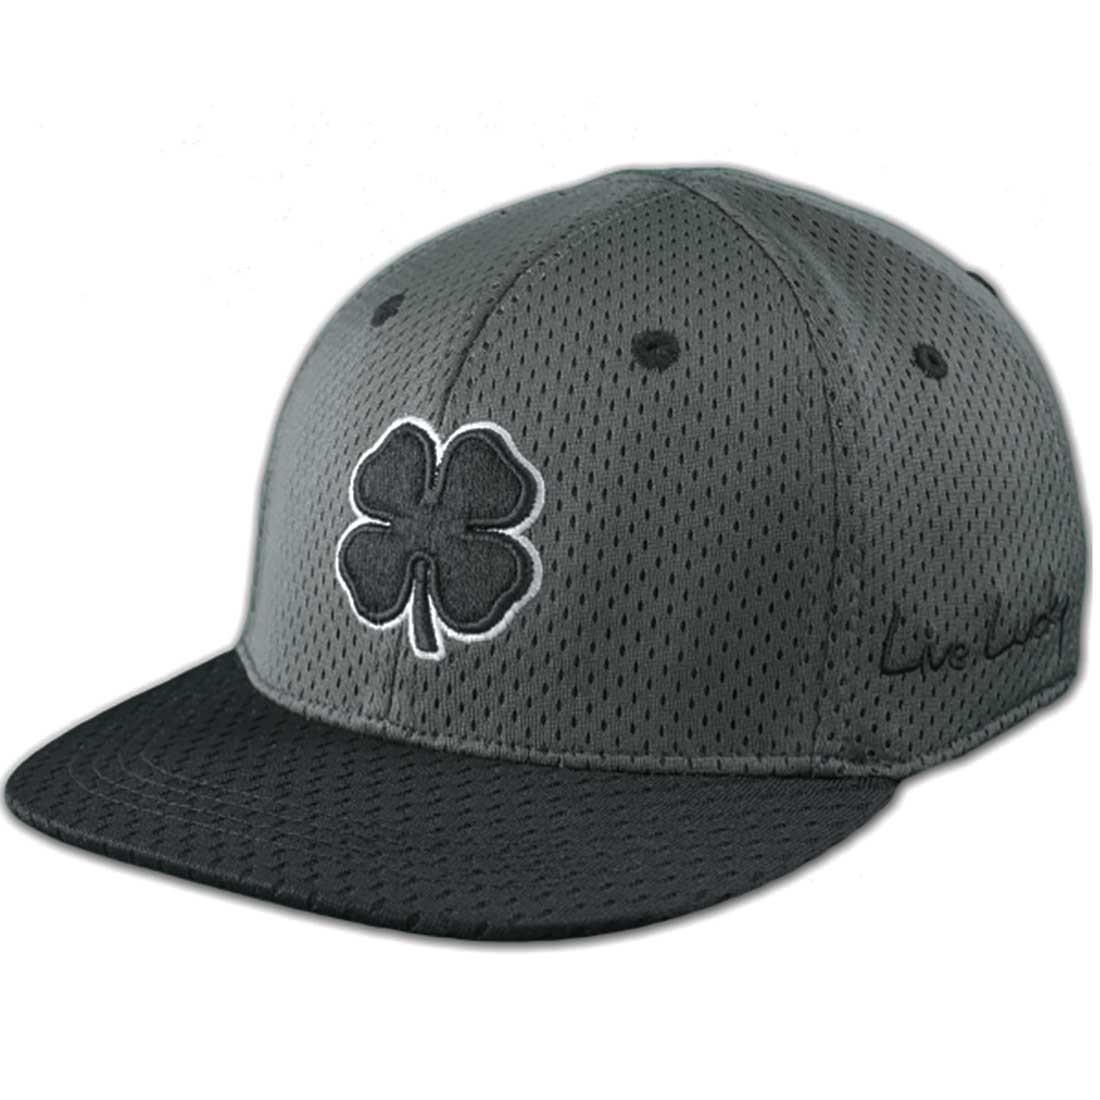 BLACK CLOVER FLAT LUCKY MESH  1HAT FLATBILL CAP -NEW 2016-PICK SIZE -  Walmart.com aa796a1db69